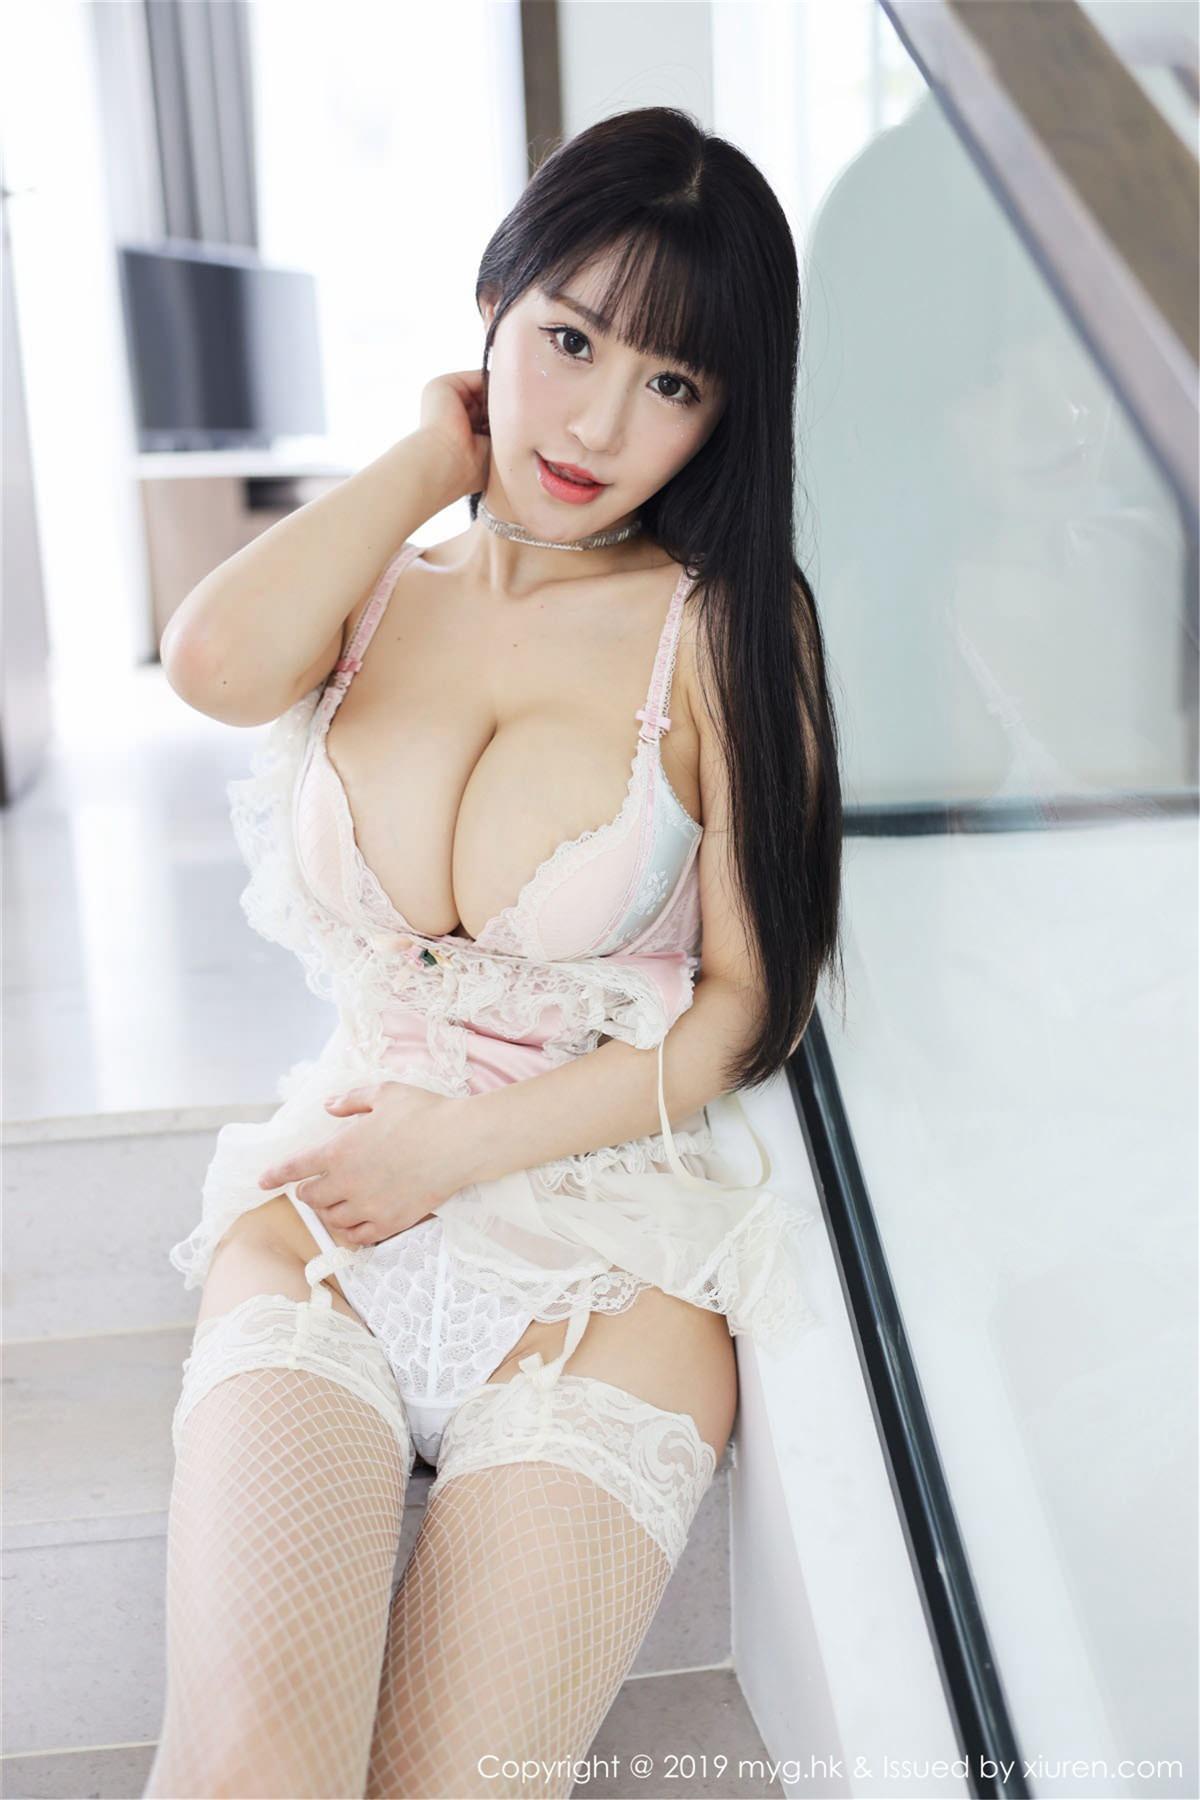 MyGirl Vol.364 6P, mygirl, Zhu Ke Er